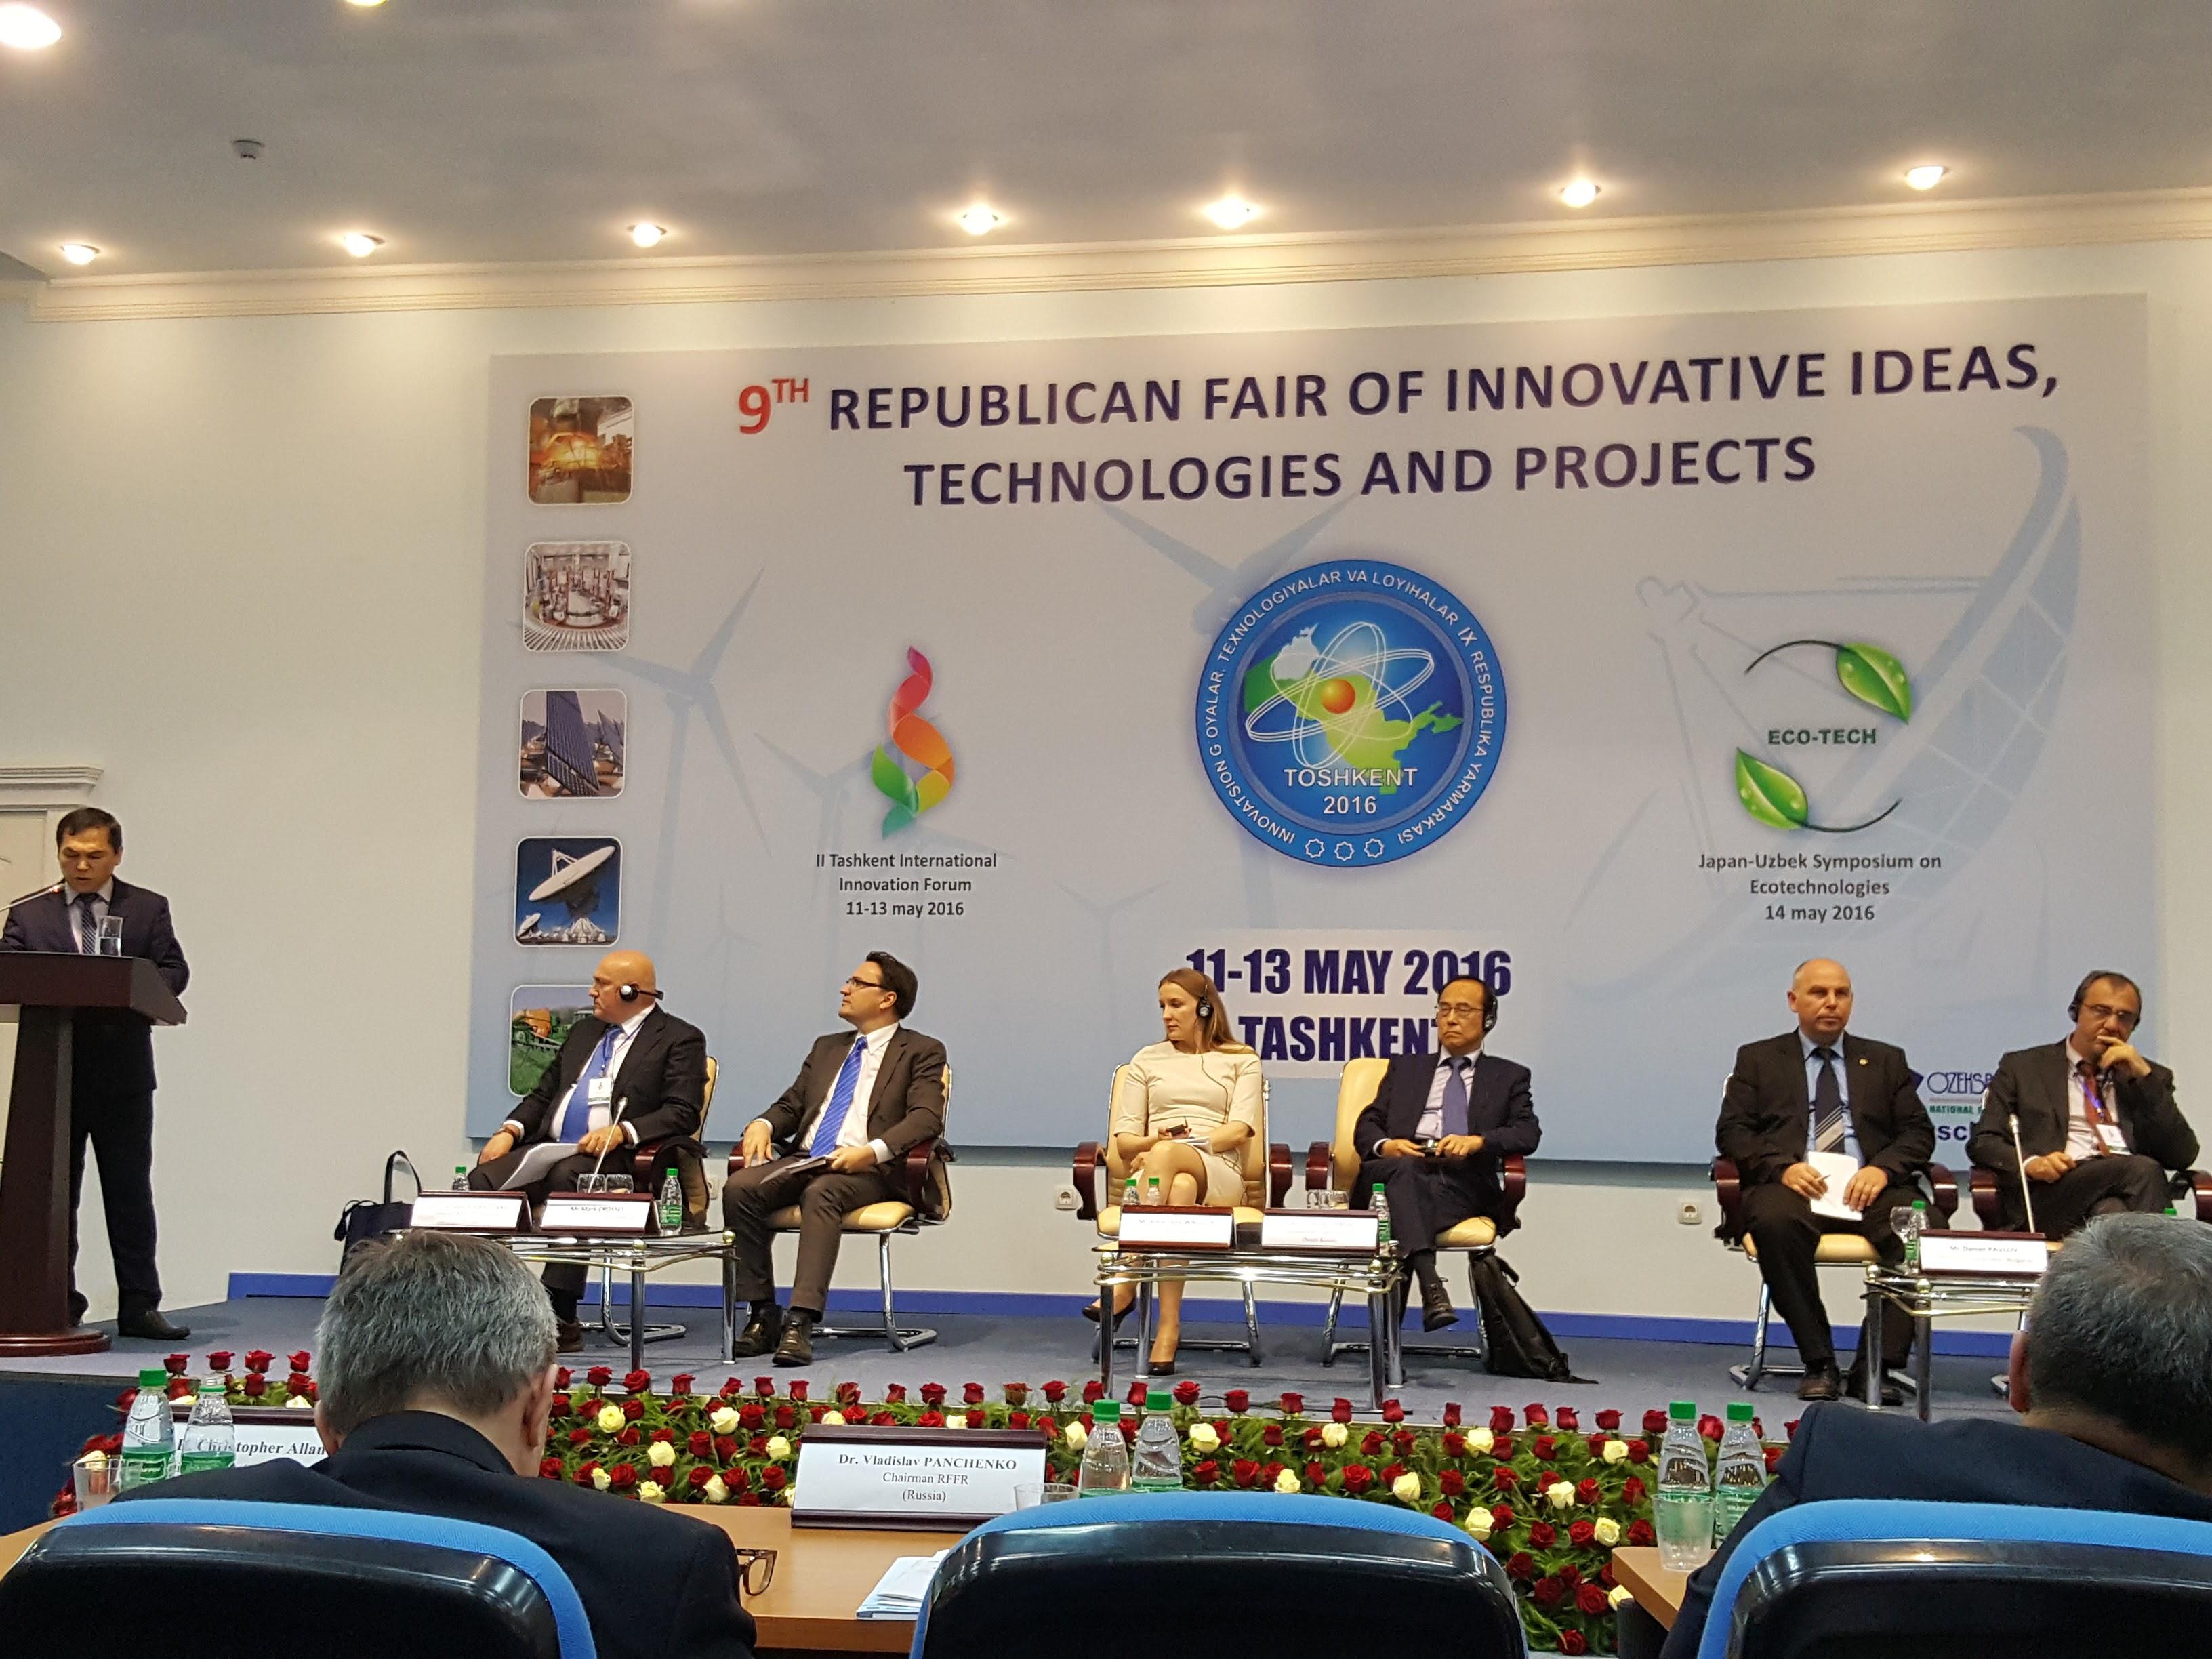 Uzbekistan International Innovation Forum